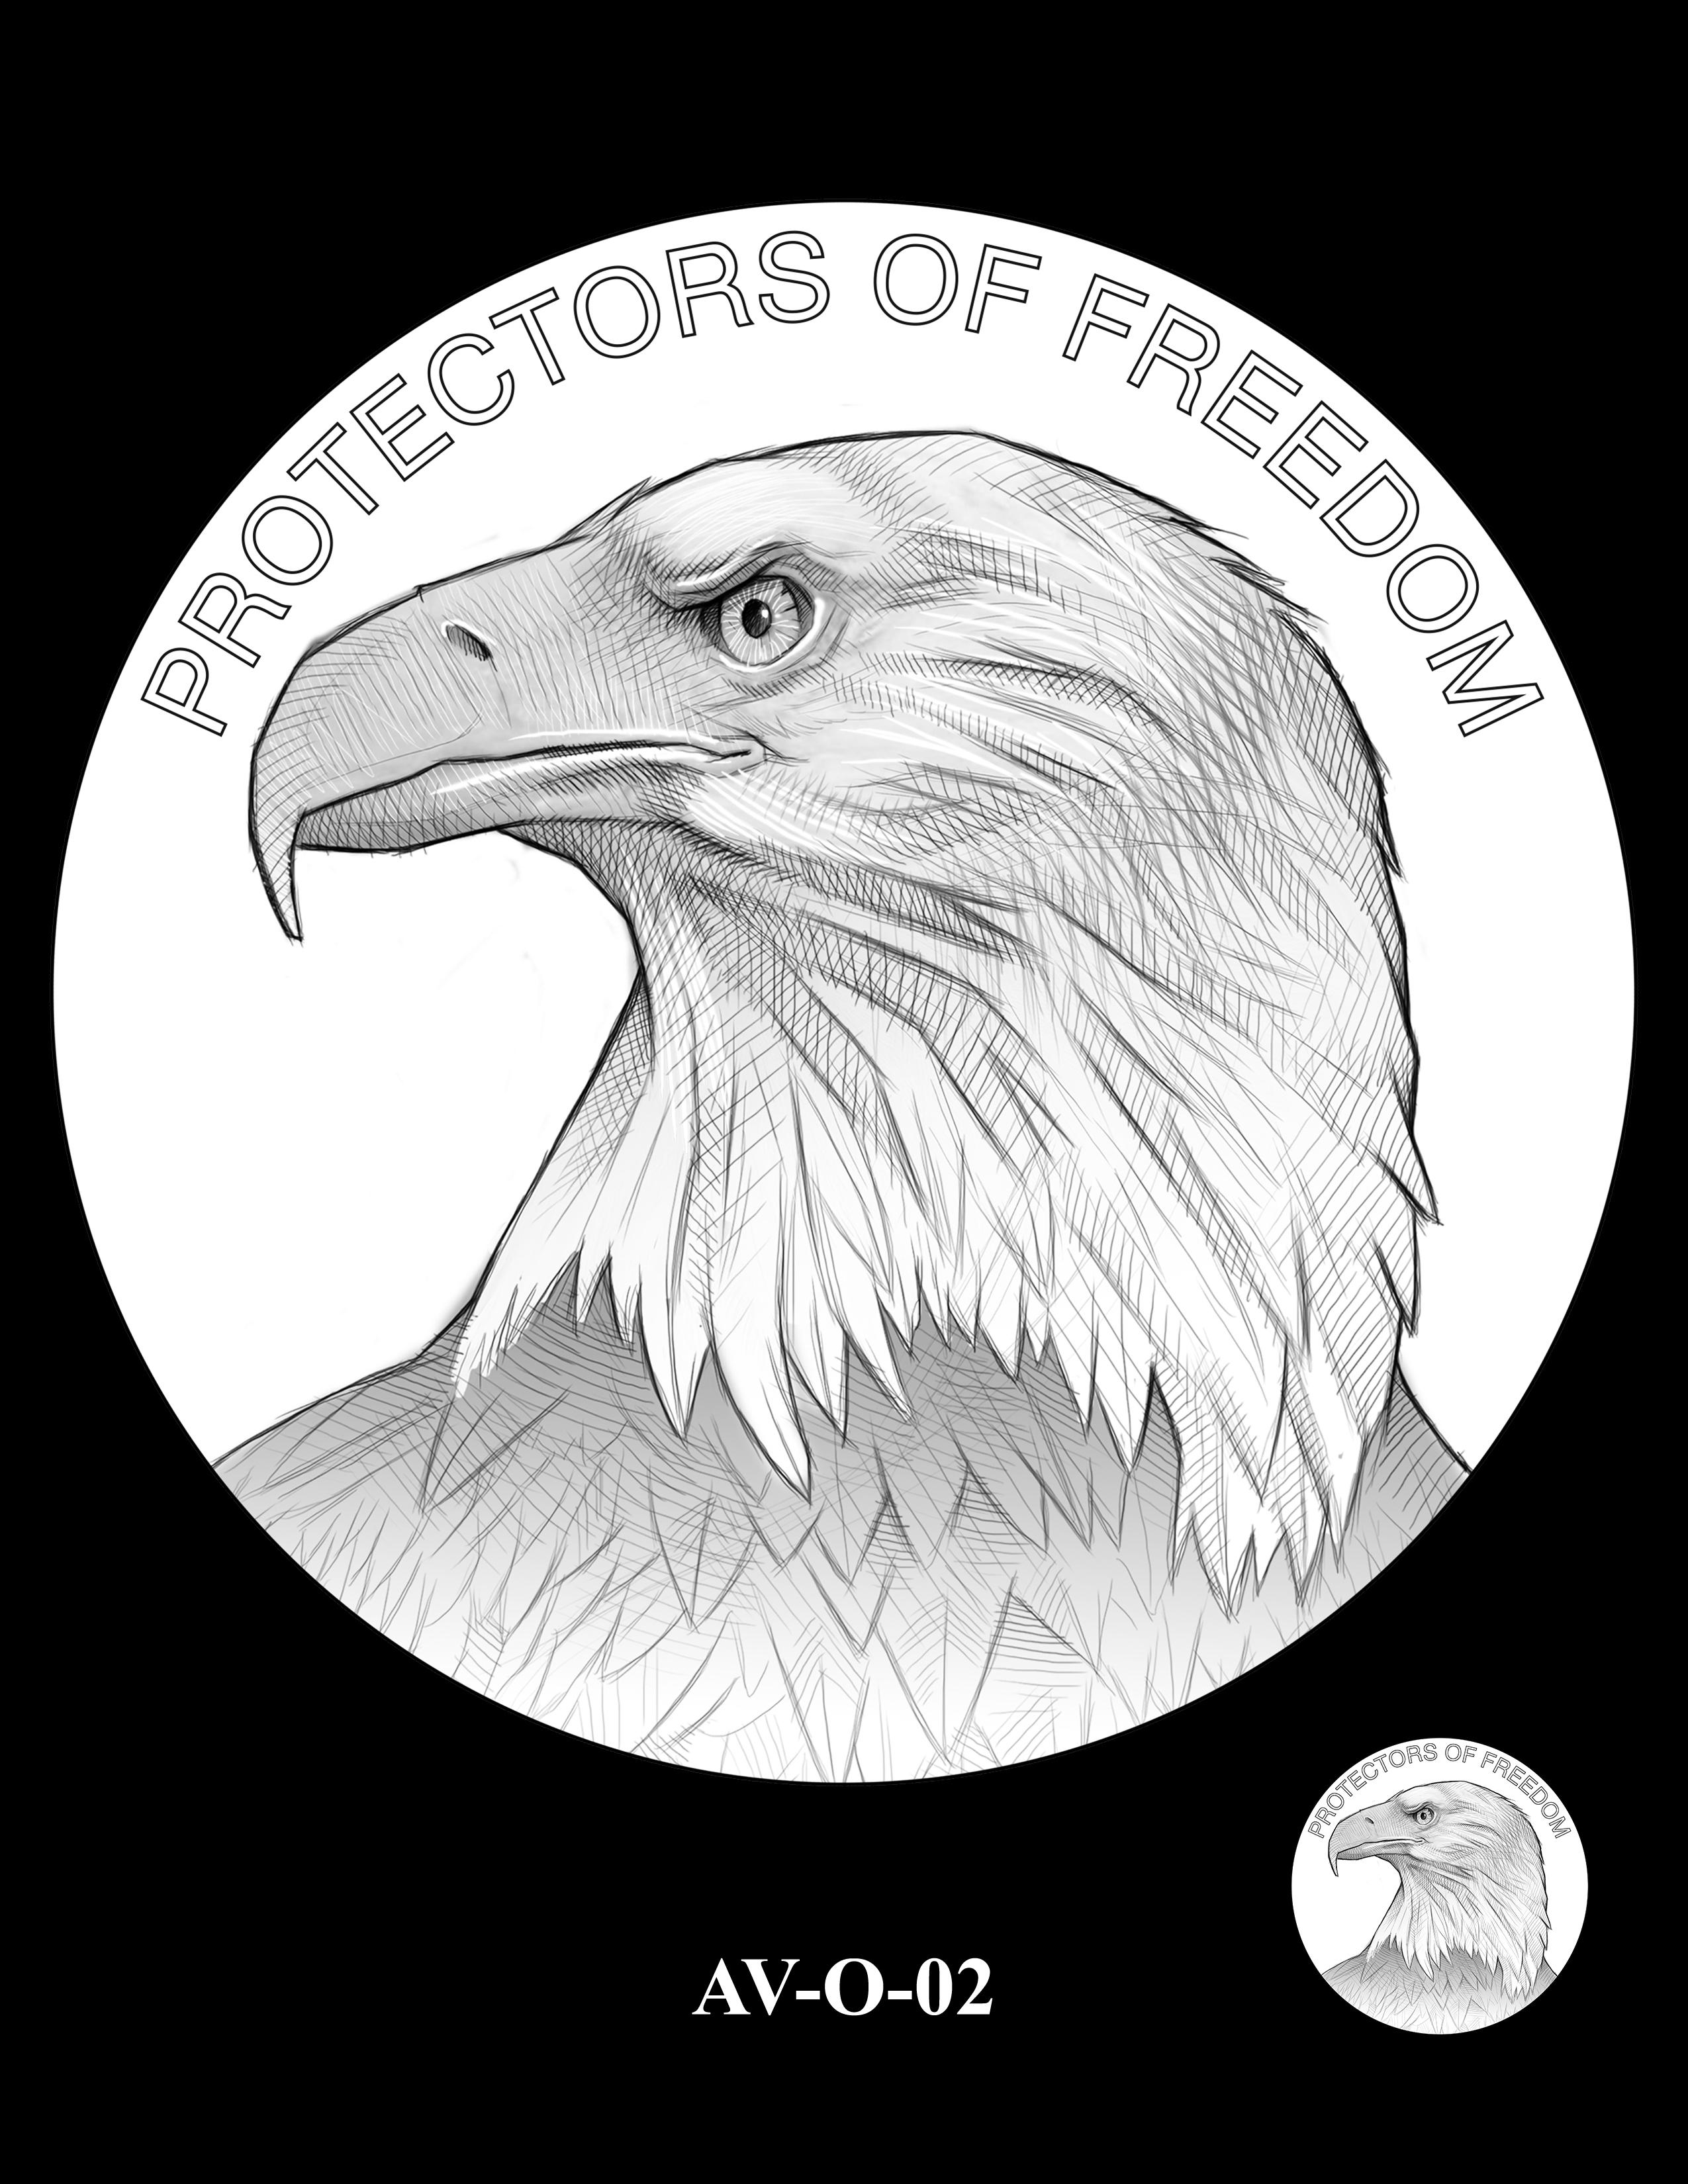 AV-O-02 - American Veterans Medal